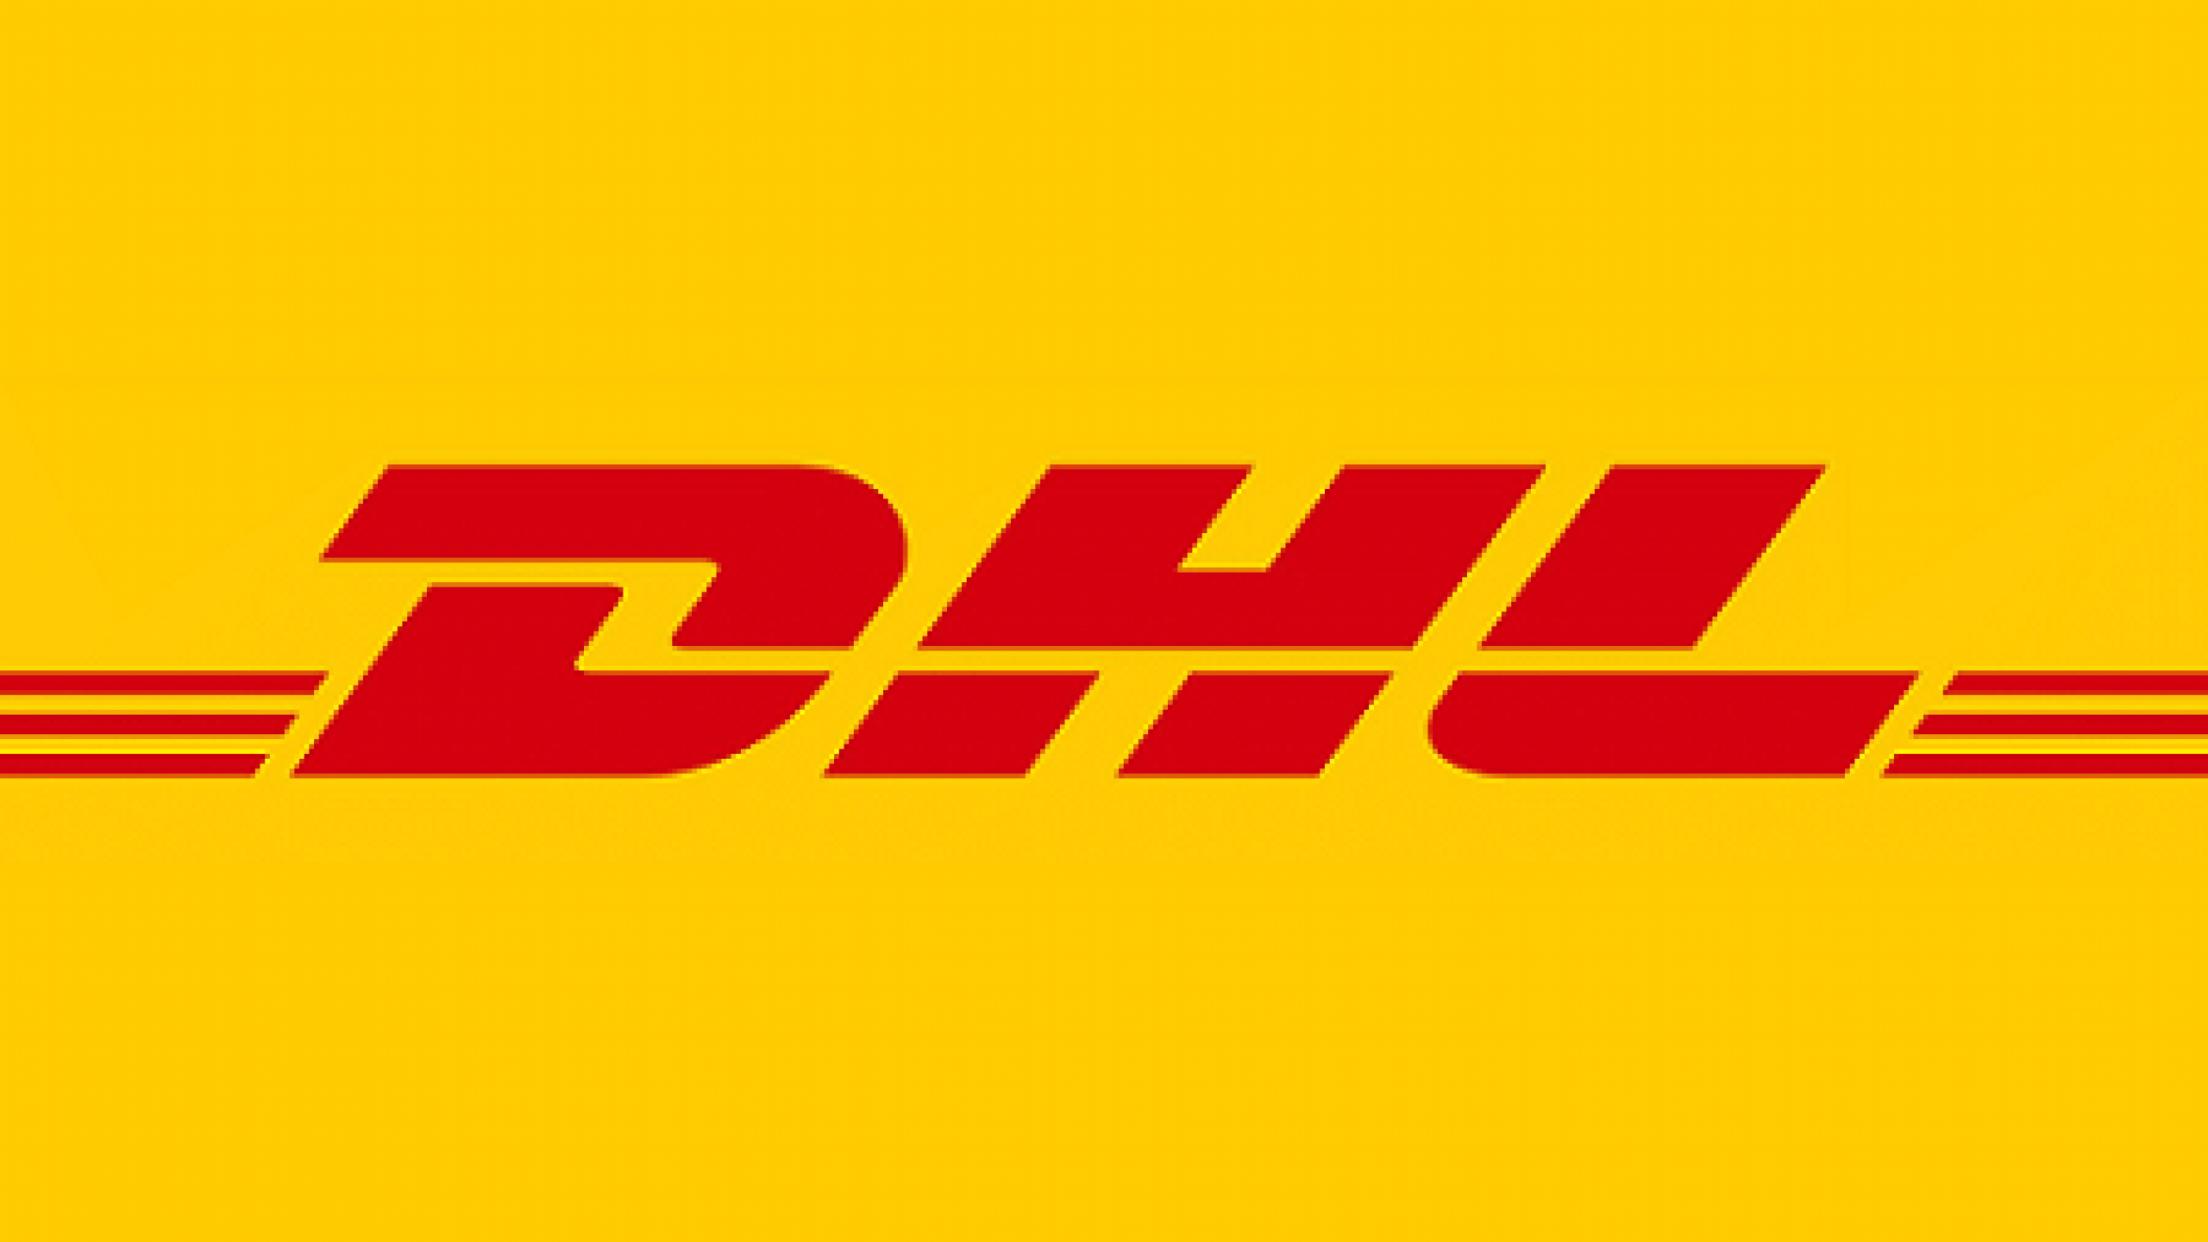 DHL Company Logo Wallpaper PaperPull 2208x1242